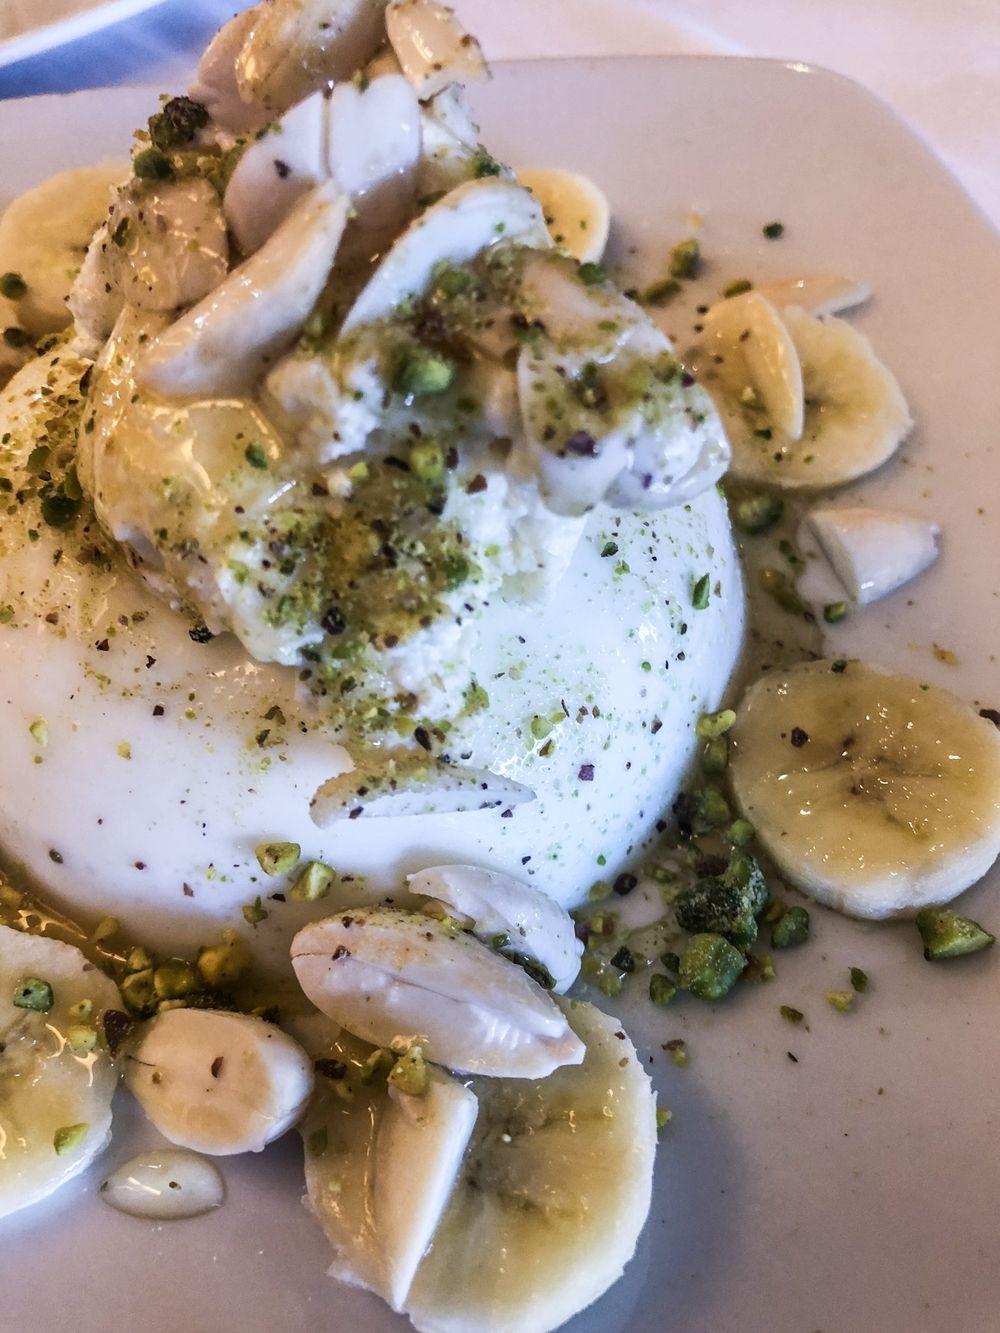 al-ajami-restaurant-beirut-breakfast-192018-09-16-08-15-09